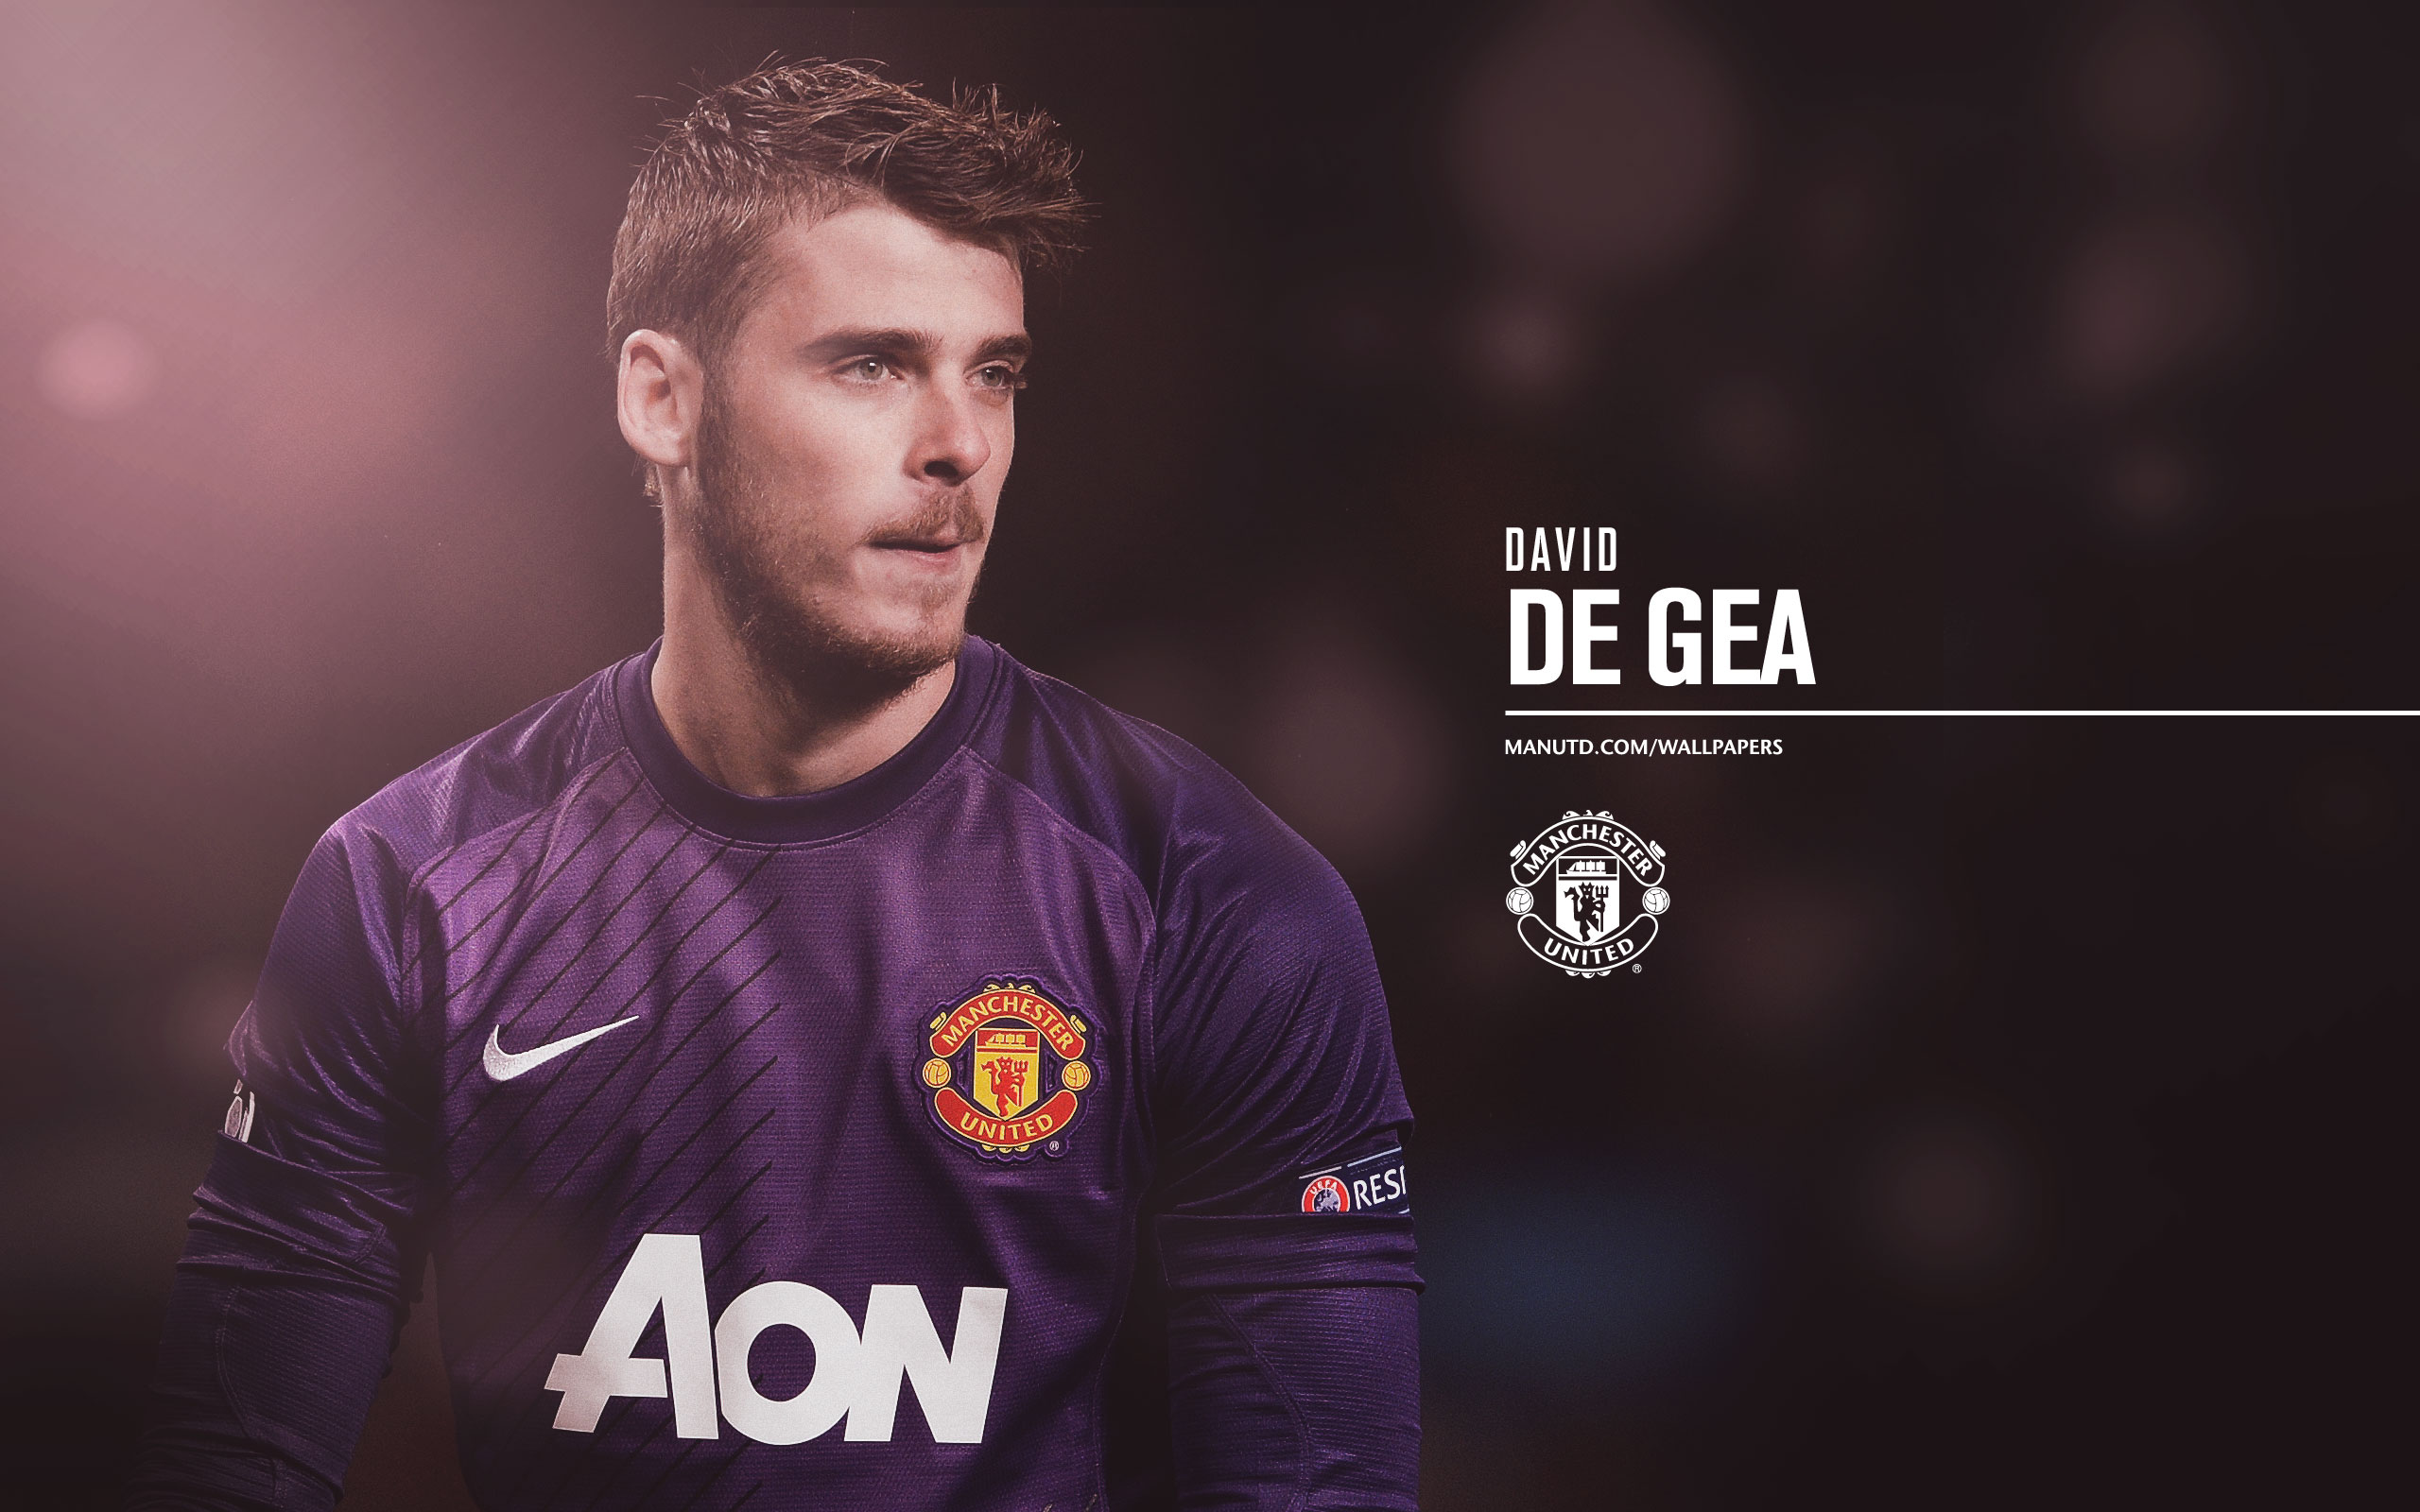 David-de-Gea-Manchester-United-Player